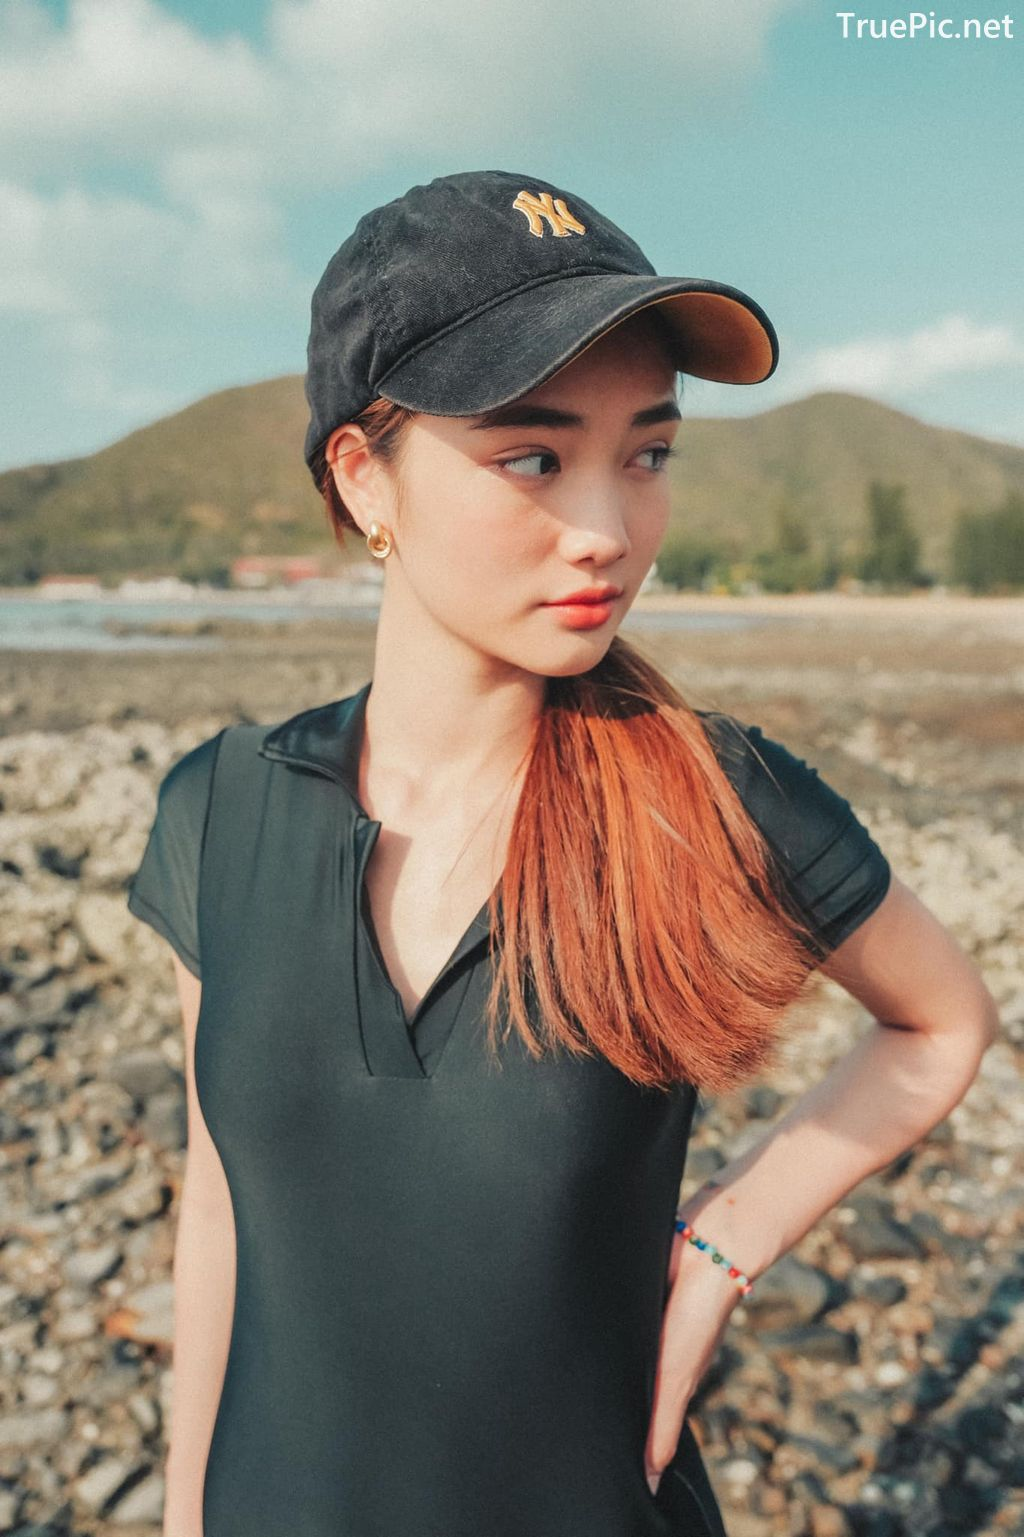 Image-Miss-Teen-Thailand-Kanyarat-Ruangrung-Black-Swimsuit-TruePic.net- Picture-8